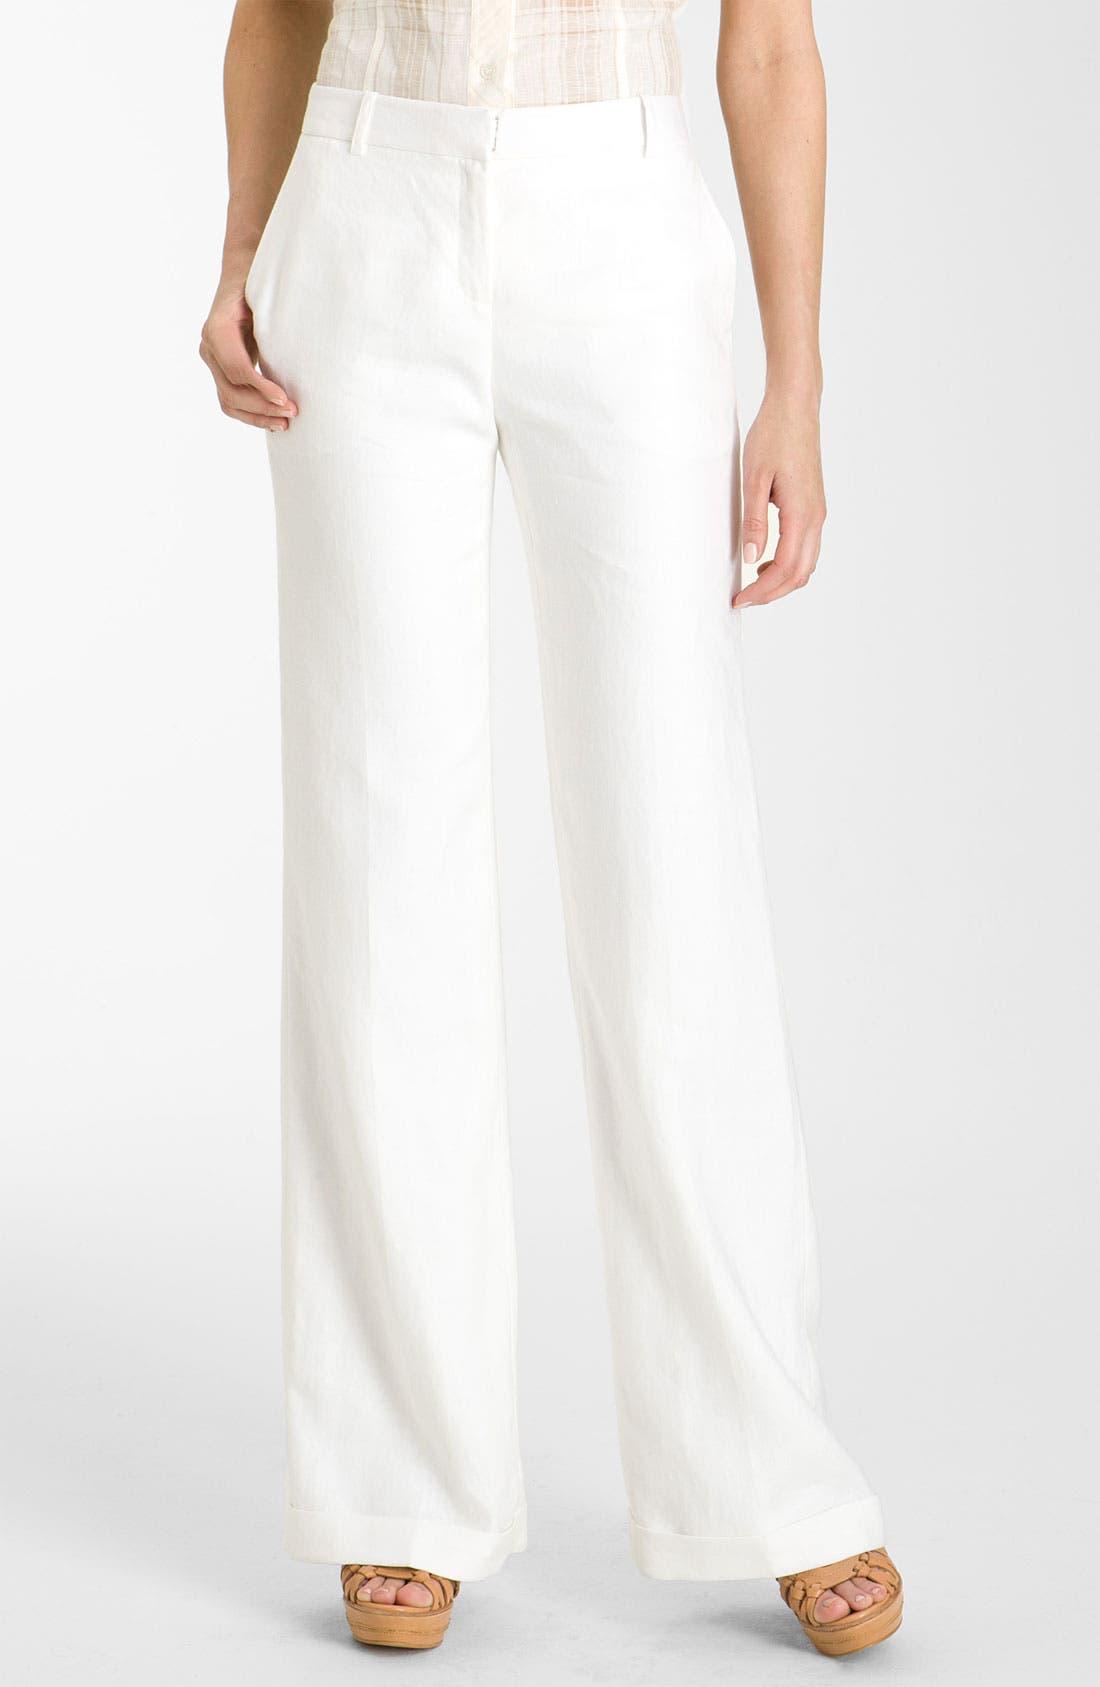 Alternate Image 1 Selected - Lafayette 148 New York 'Lavish' Cuff Linen Pants